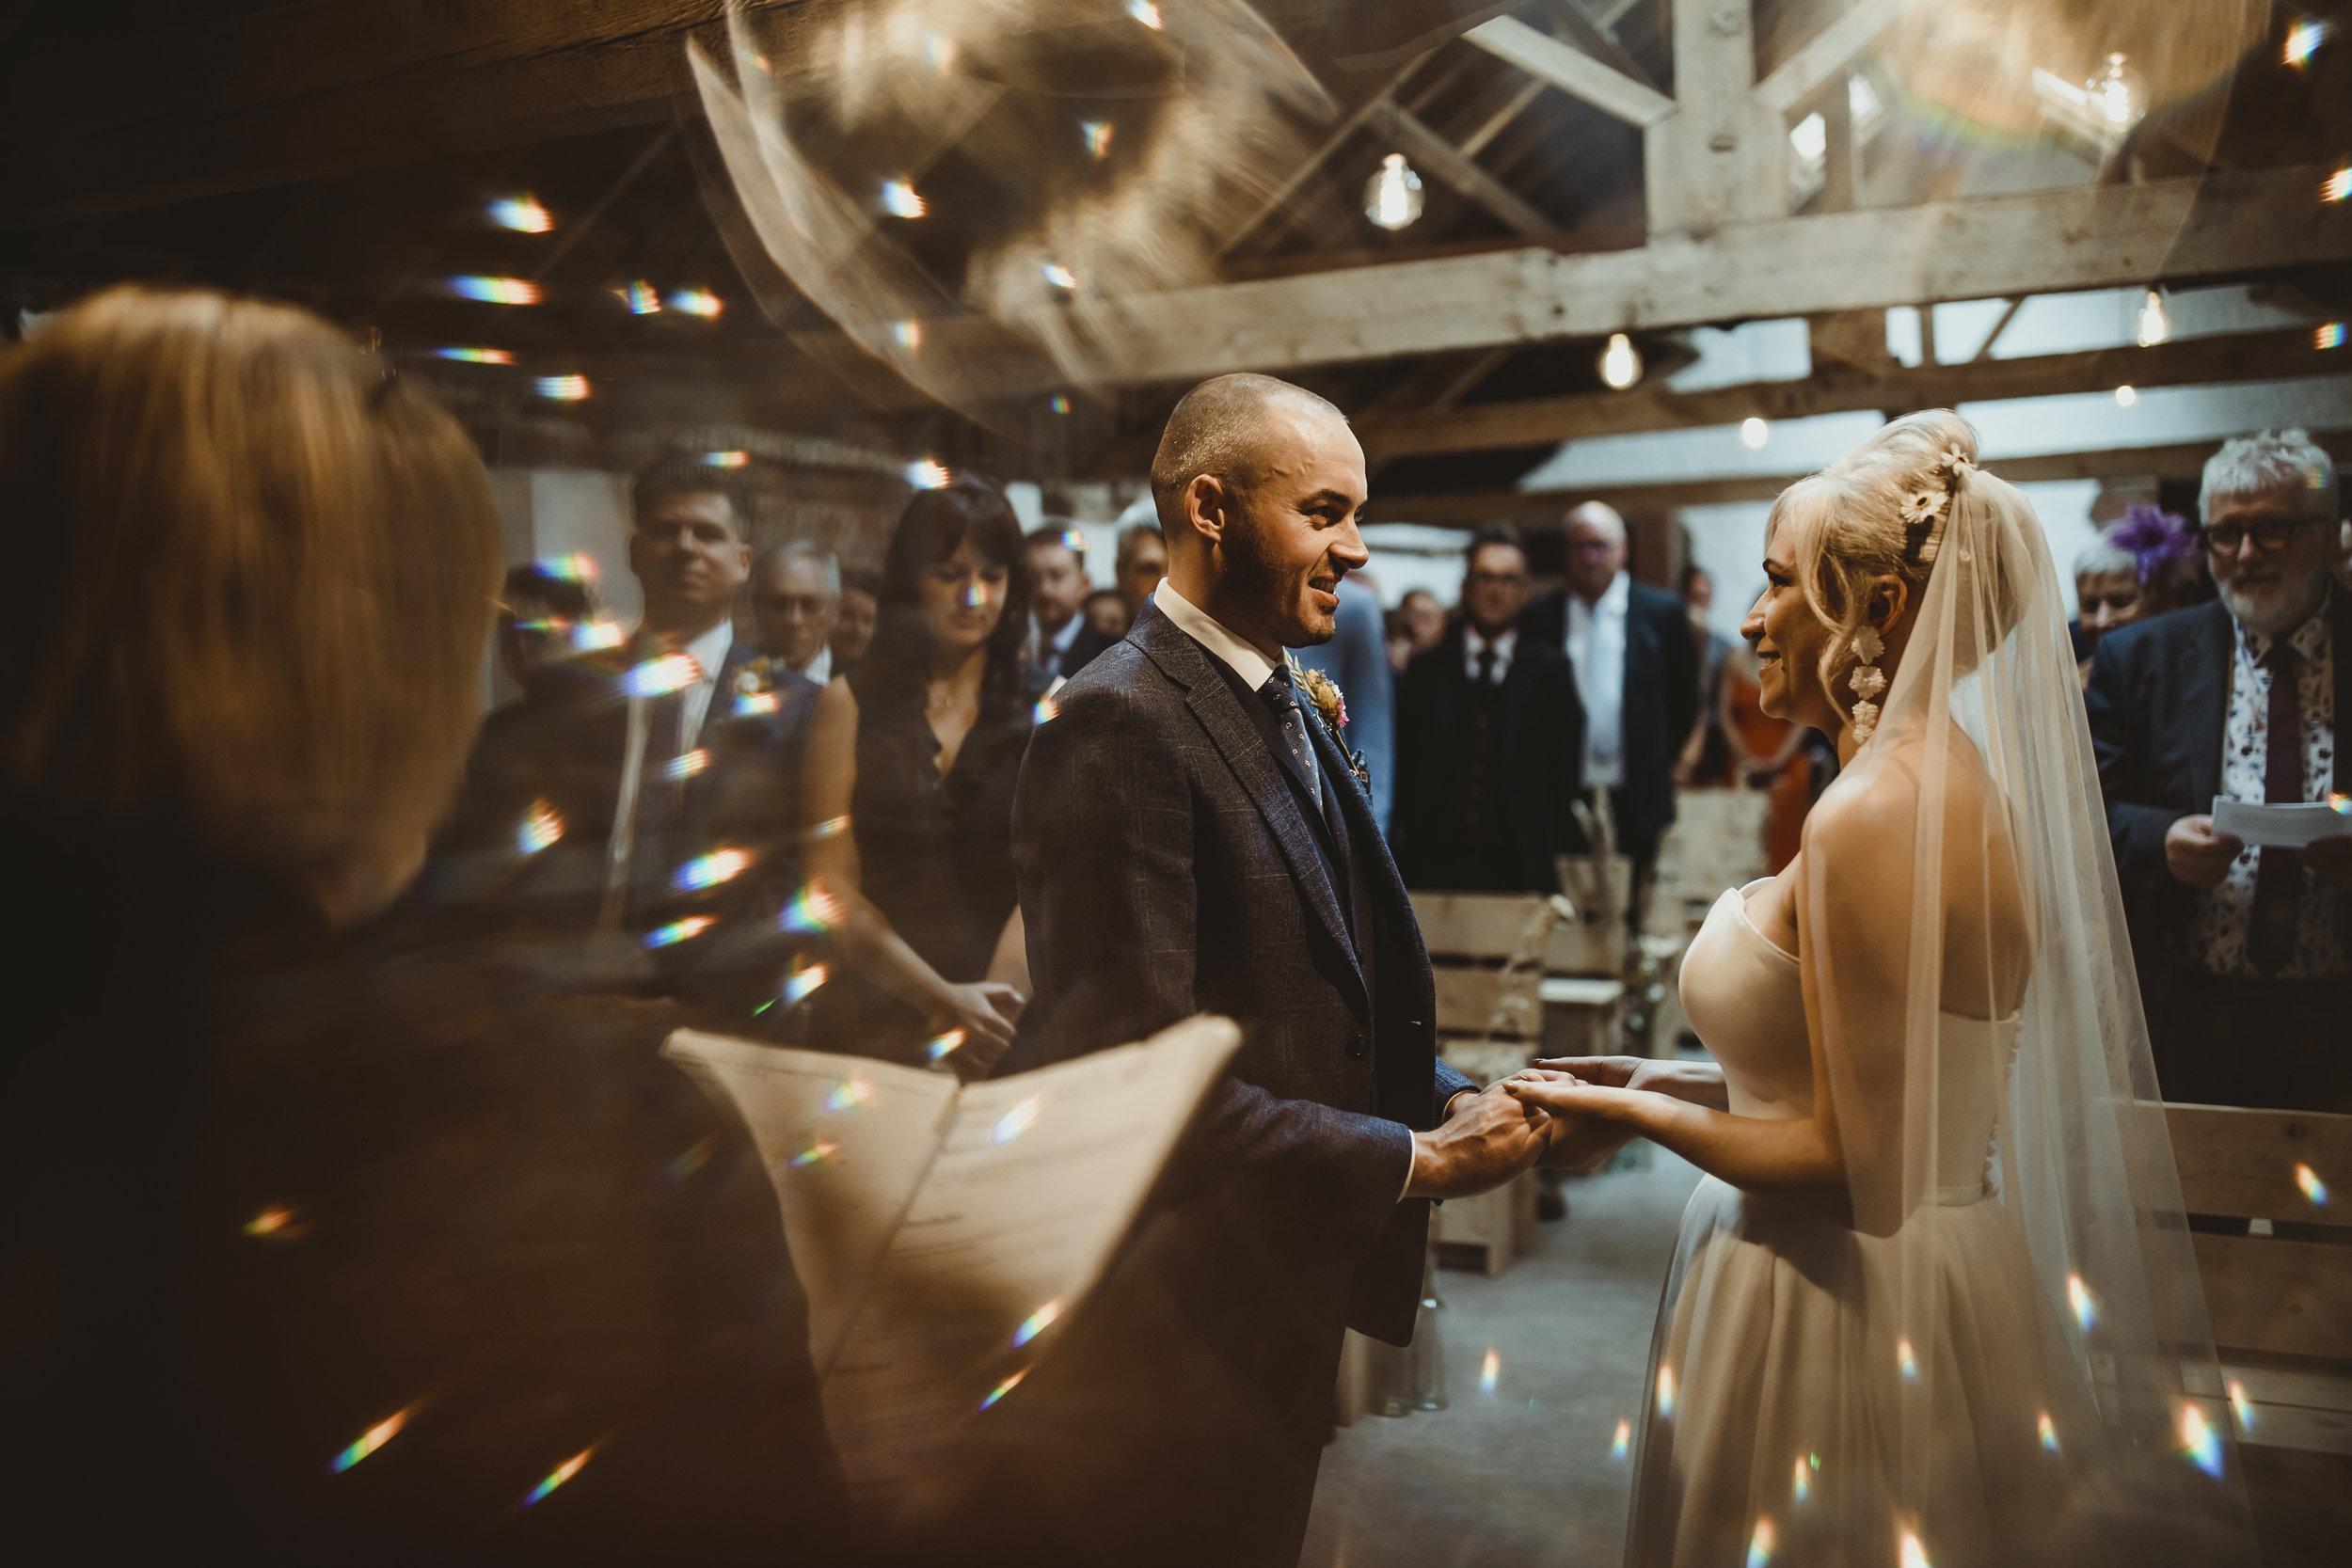 A&E_North_Yorkshire_Wedding_Photographer_York_London_Harrogate-9.JPG